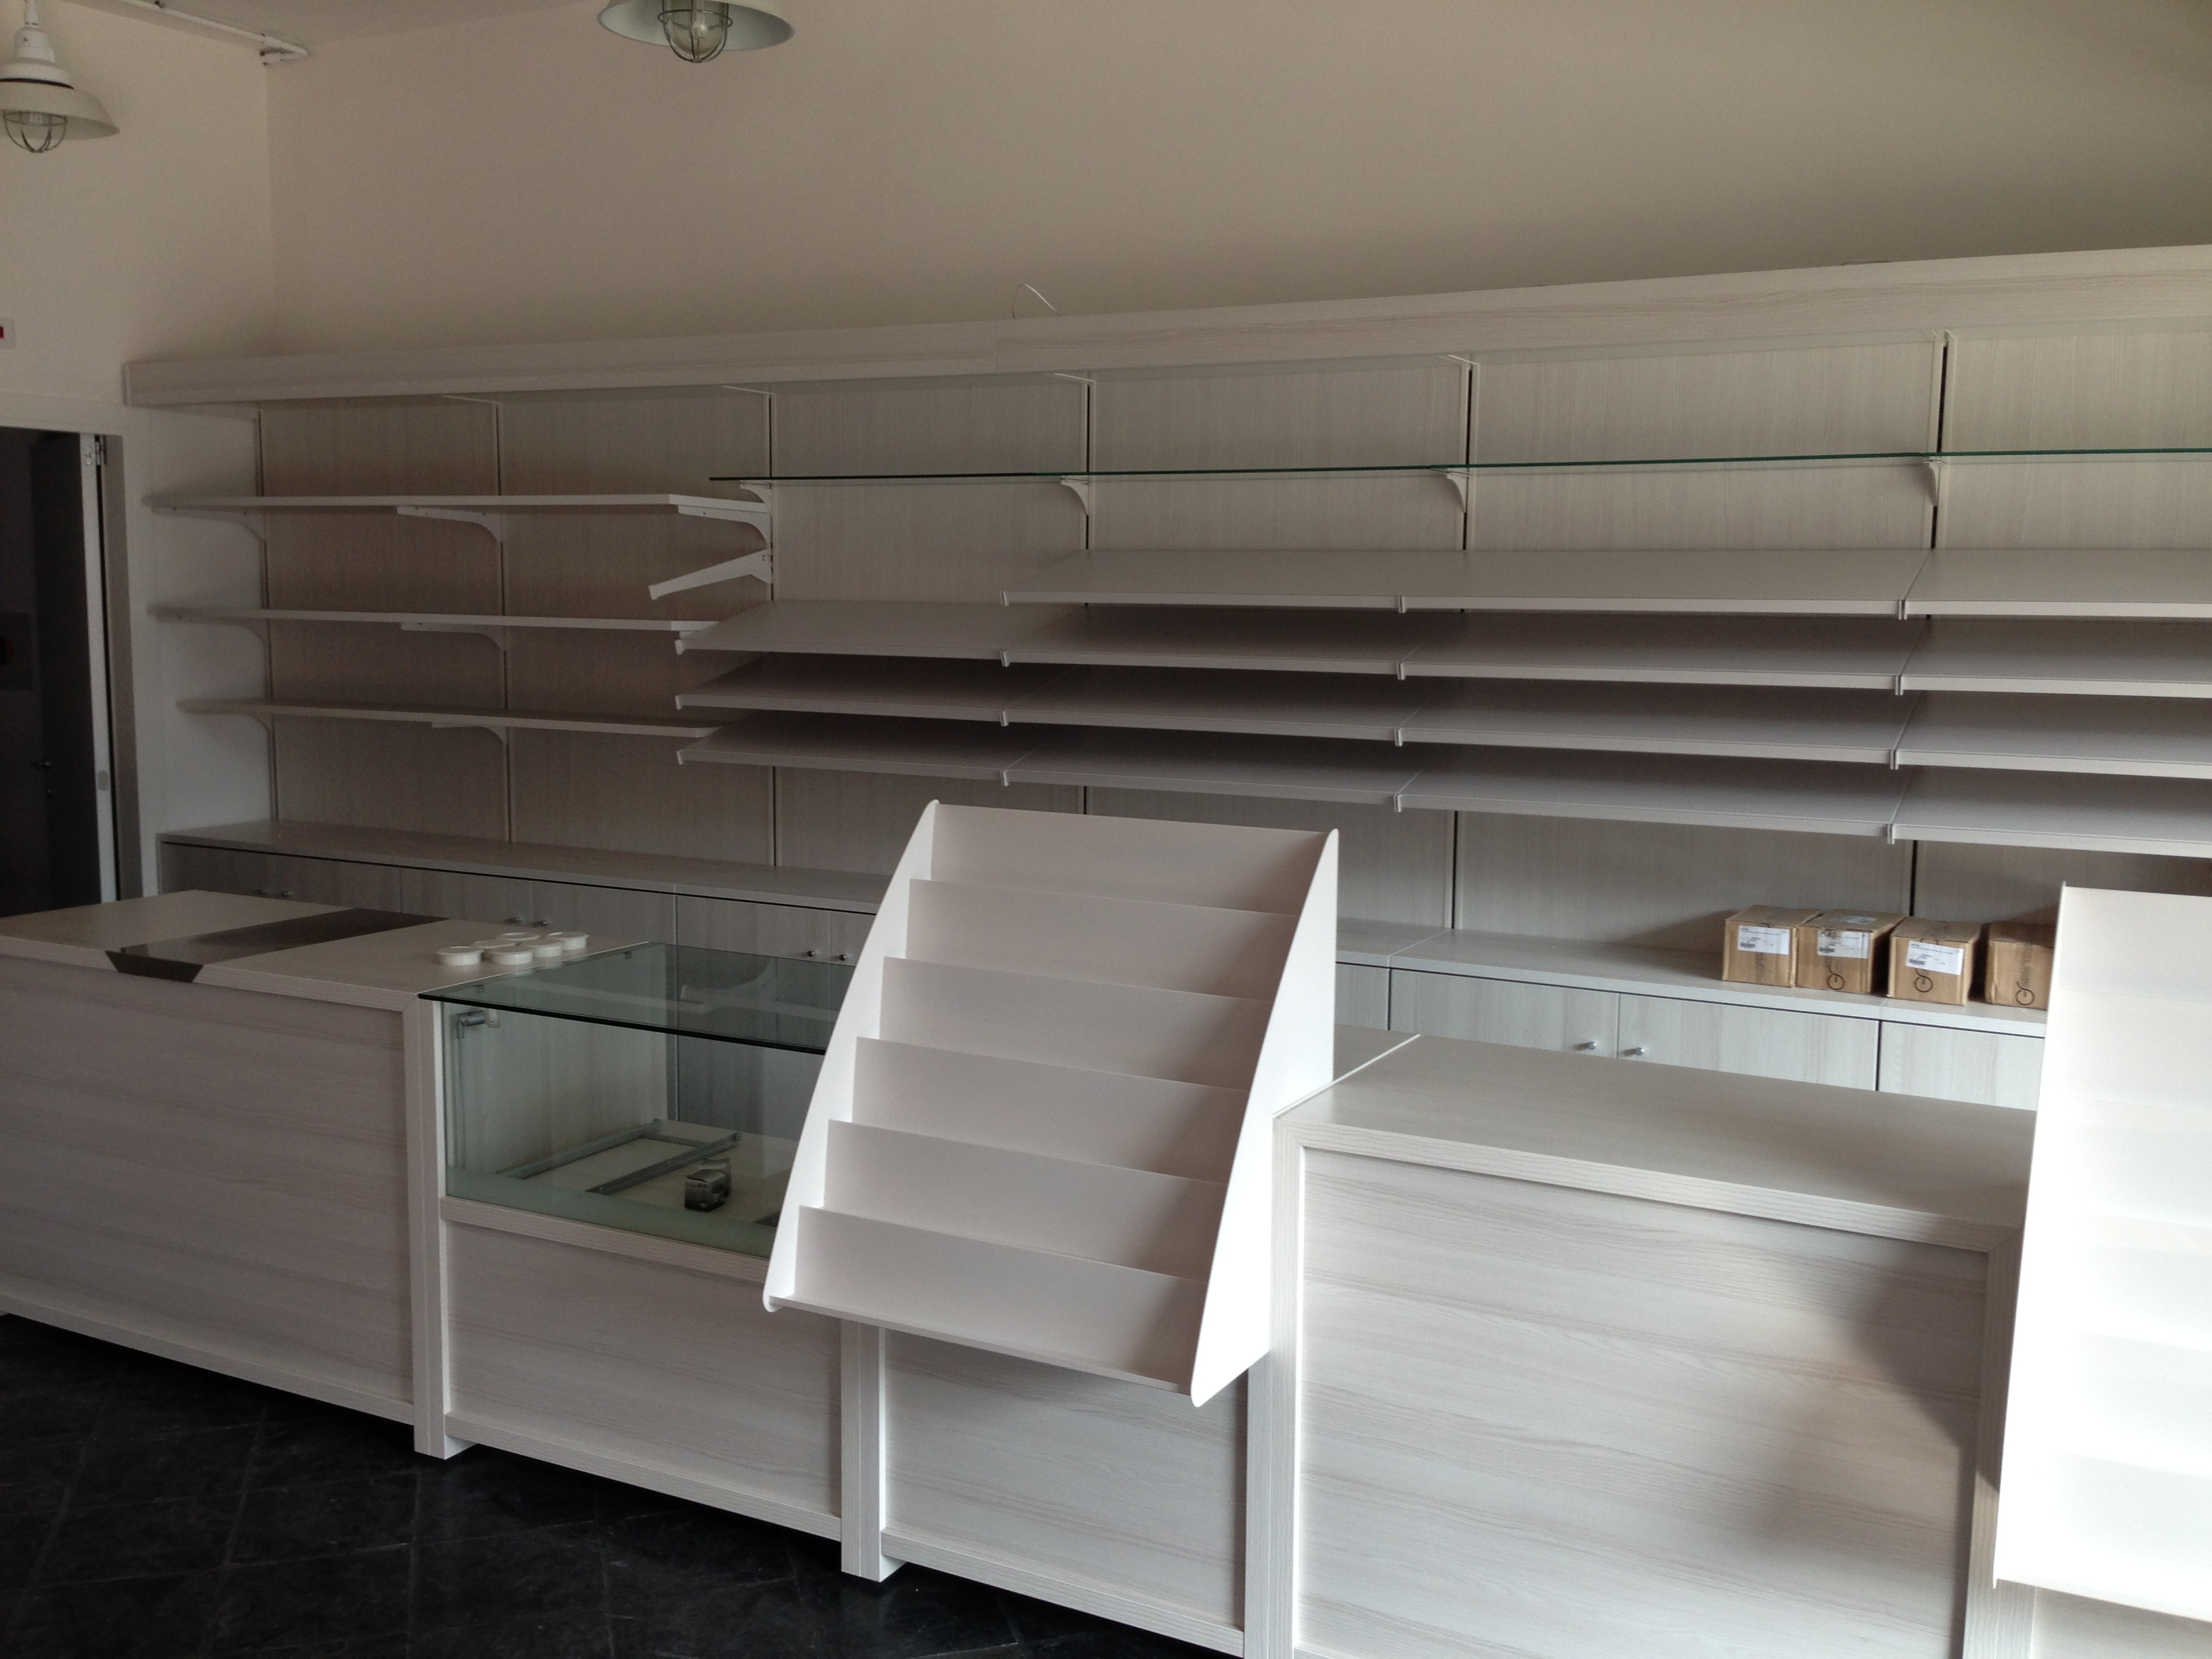 Milano arredamento awesome arredobagno milano mobili da for Arredamento usato a milano